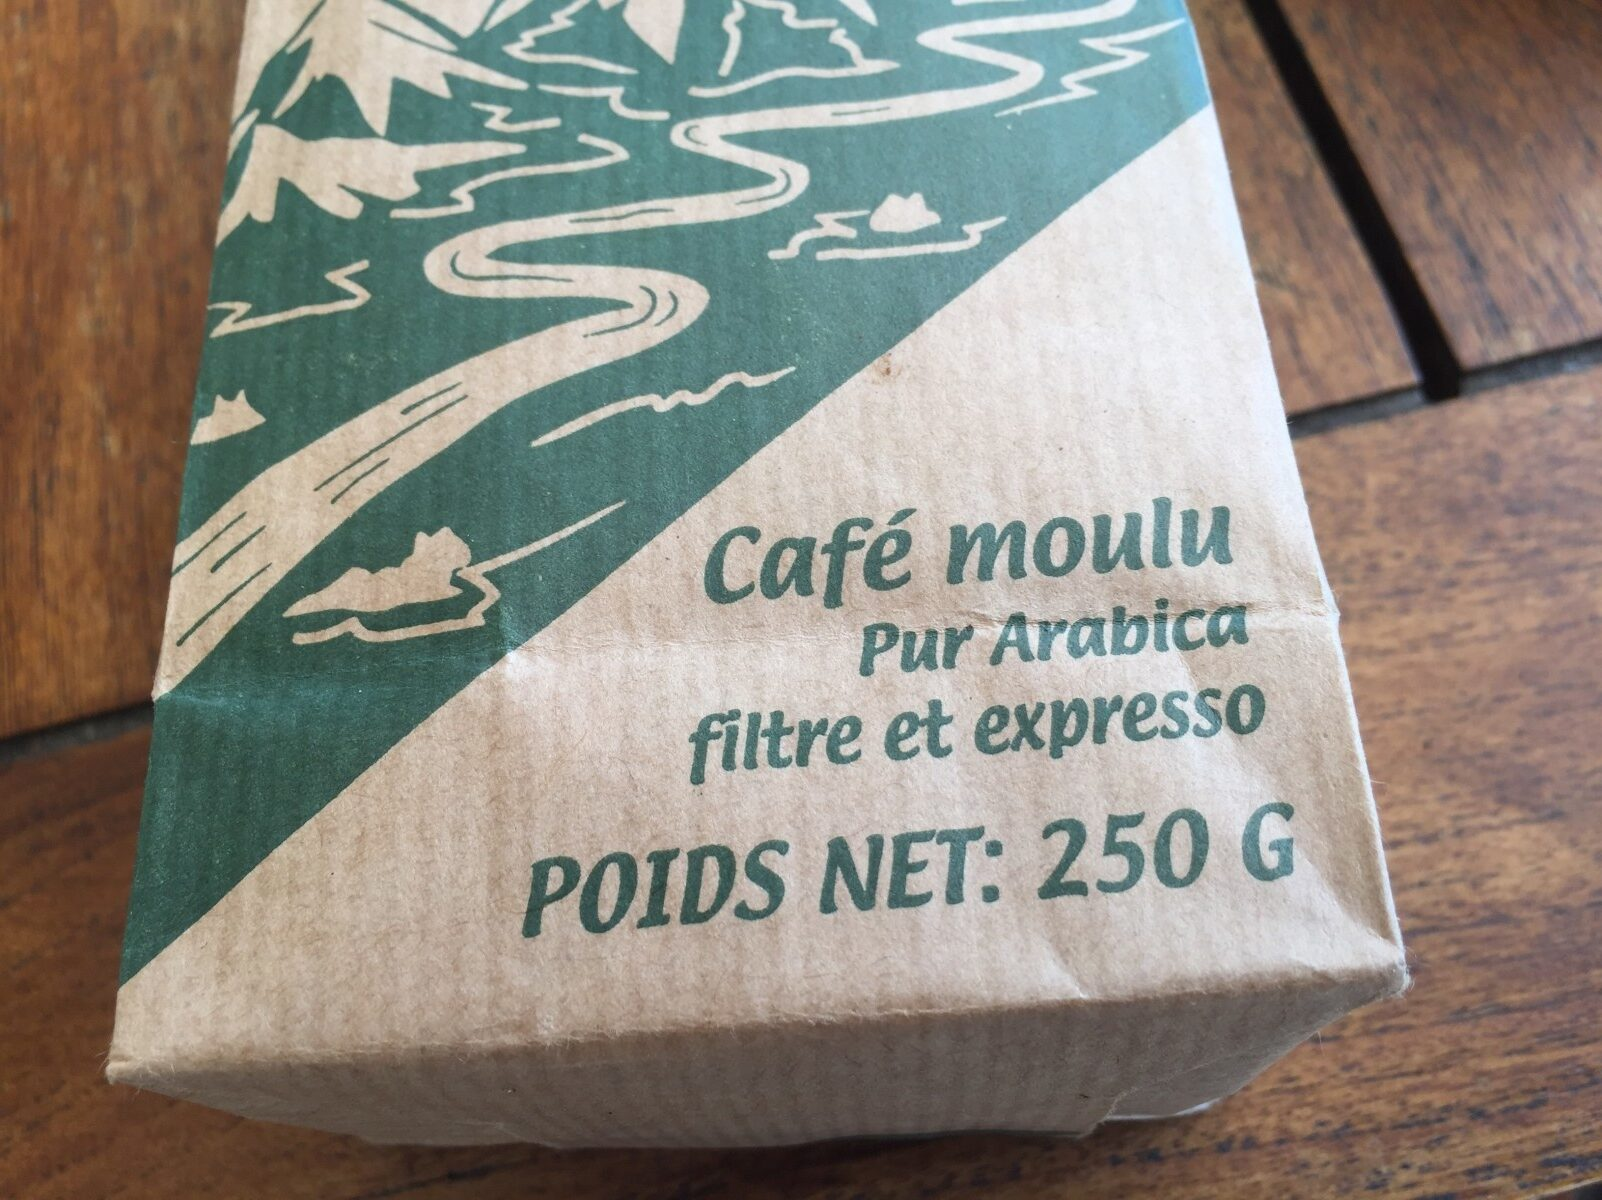 Cafe en poudre - Ingrédients - fr